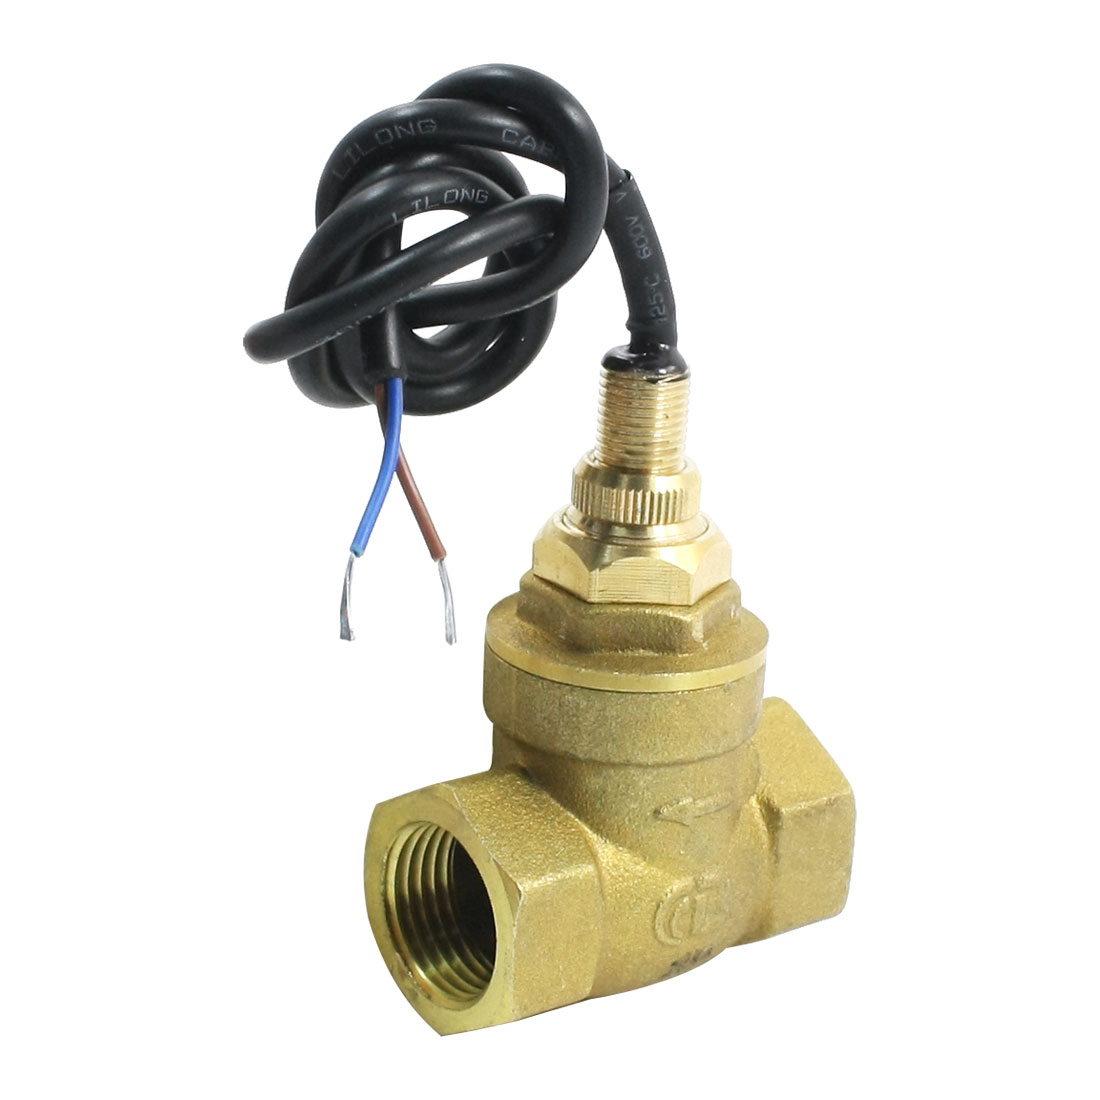 SEN-DB15 1/2PT Female Thread Brass Paddle Type Water Flow Sensor Switch Flowmeter 1-30L/Min 70W